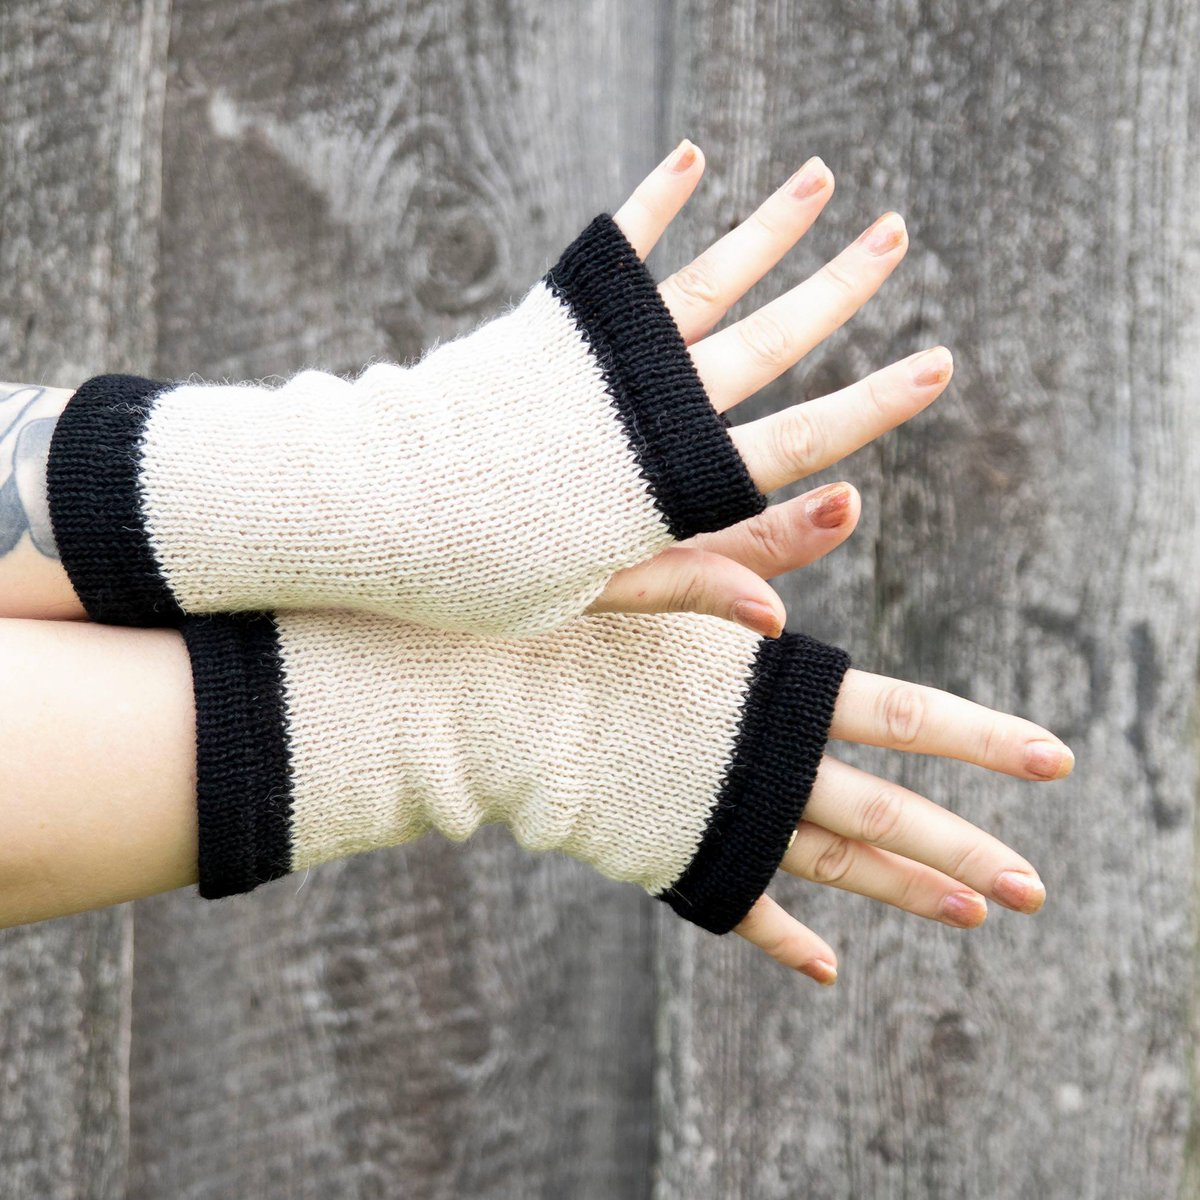 #Fingerless #knit #Gloves #soft #wool #mittens #merino #alpaca wool #beige #black #handmade #mitts #GiftforHer  @Etsy